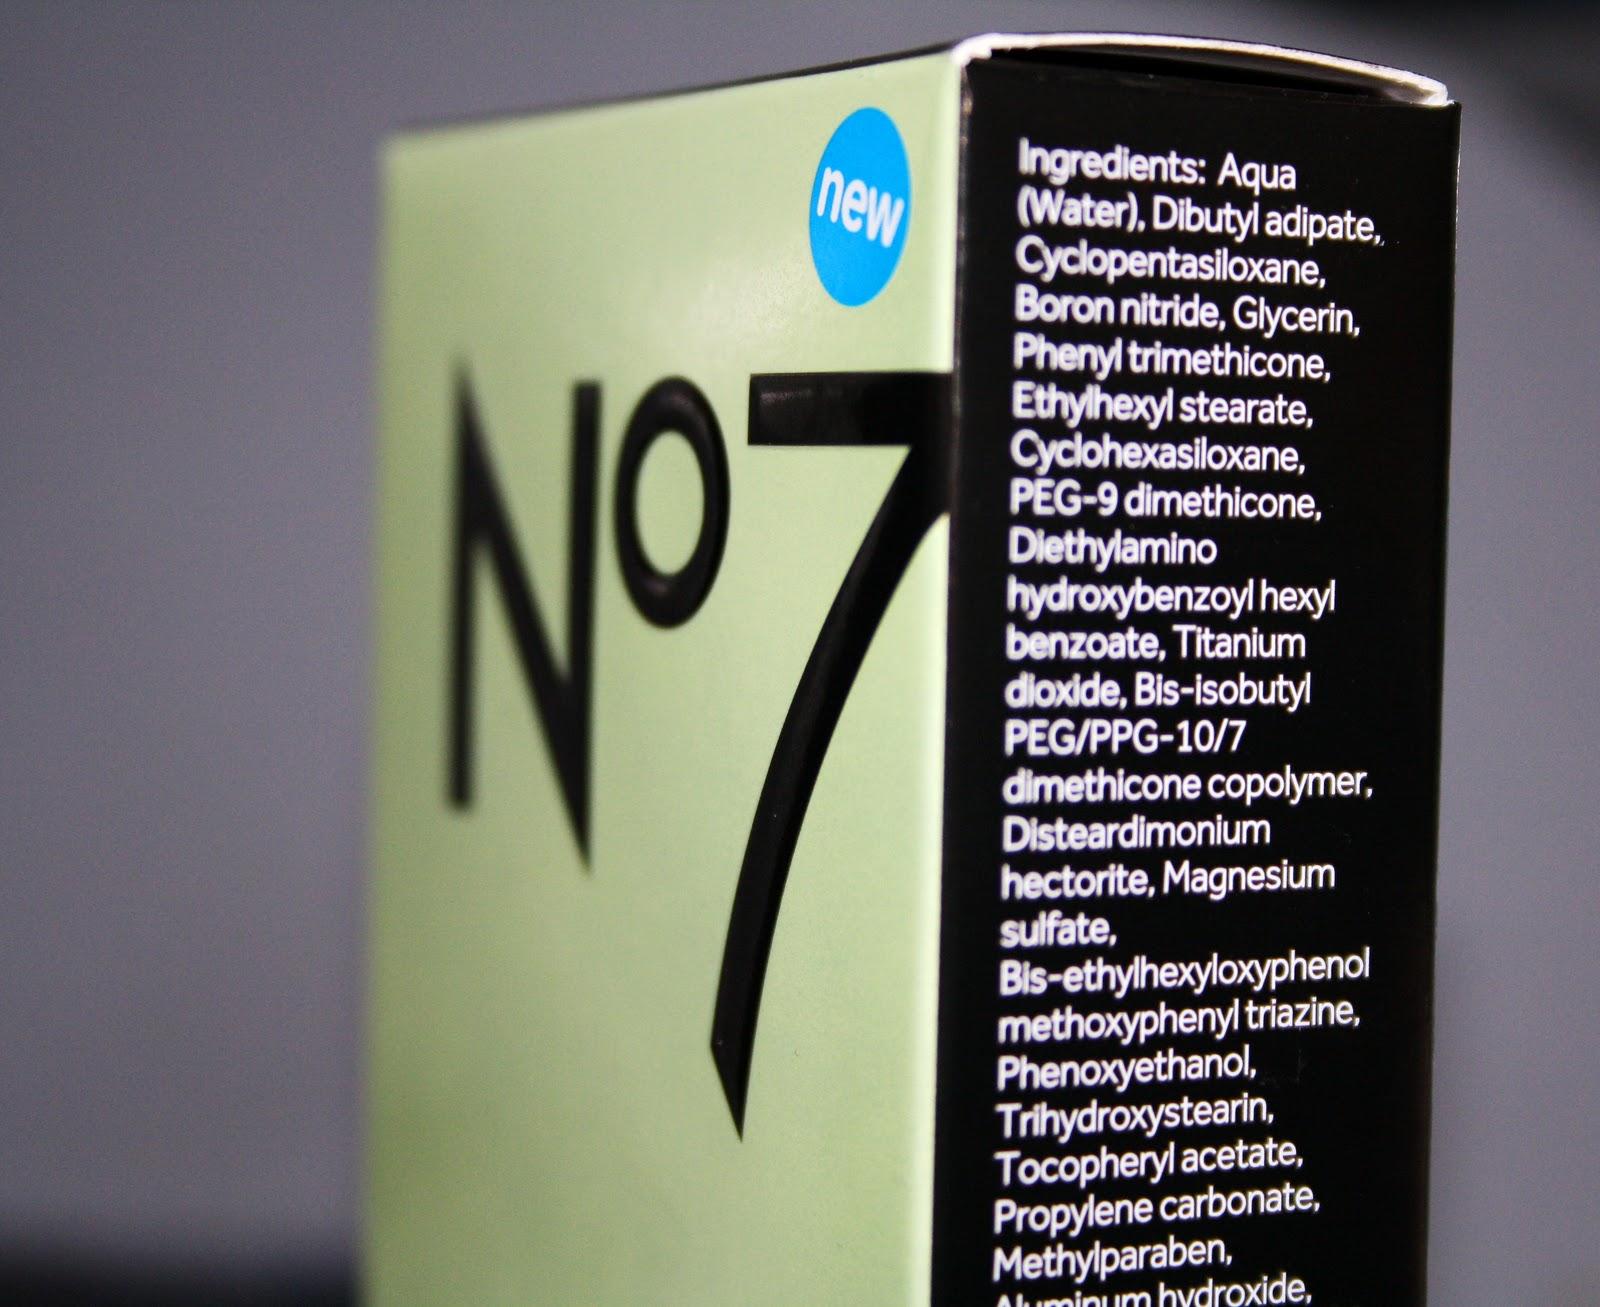 No 7 cream / Instant wrinkle cream